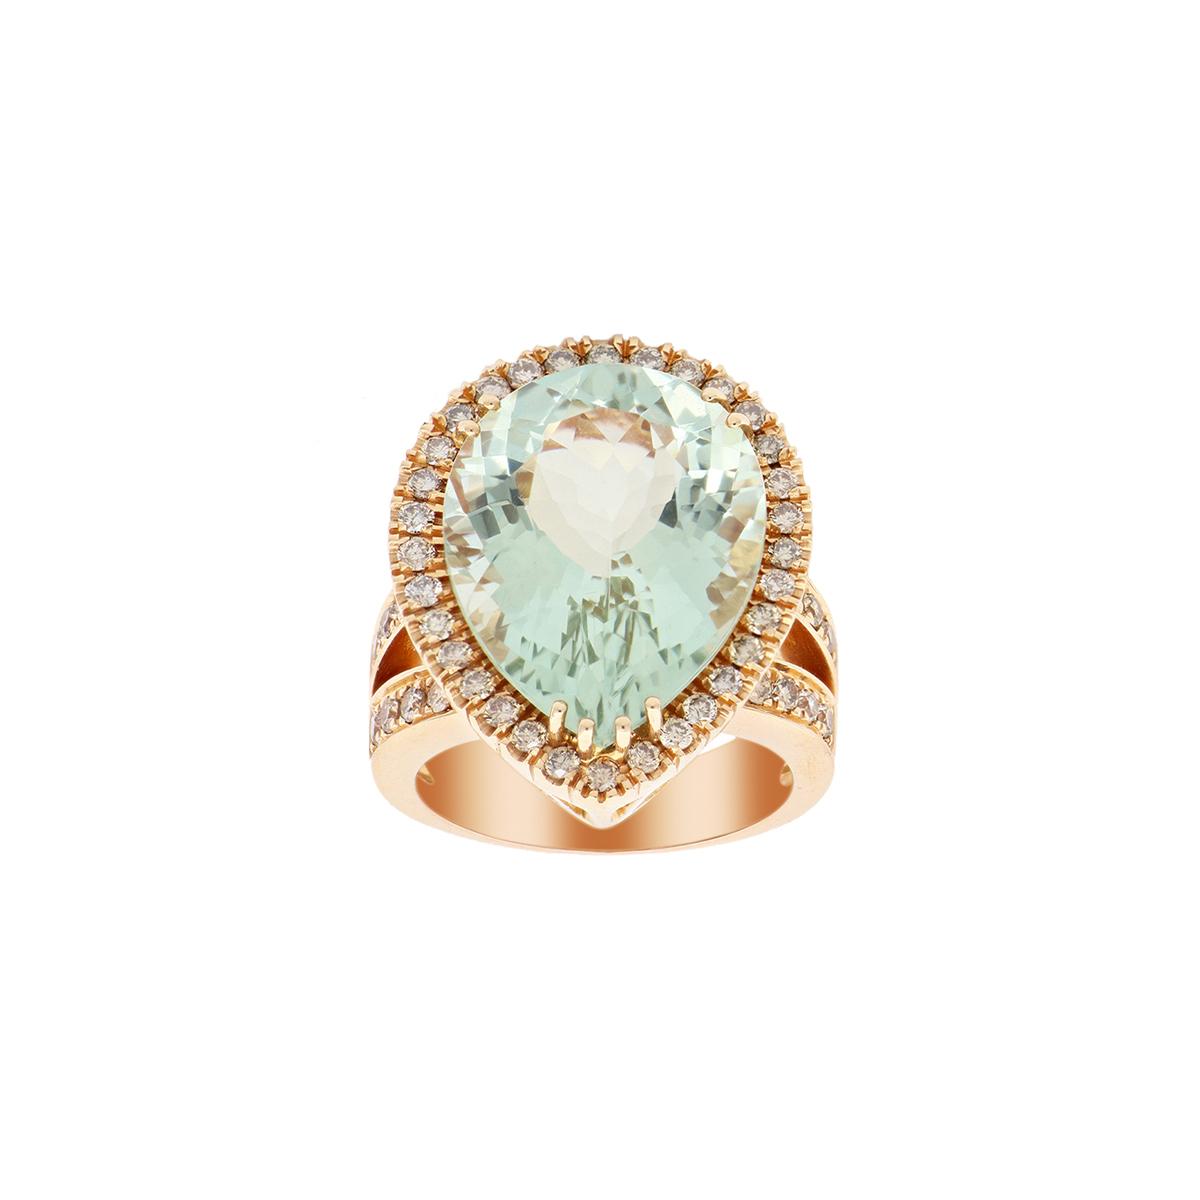 Pear-Cut Amethyst Ring with Diamond Halo